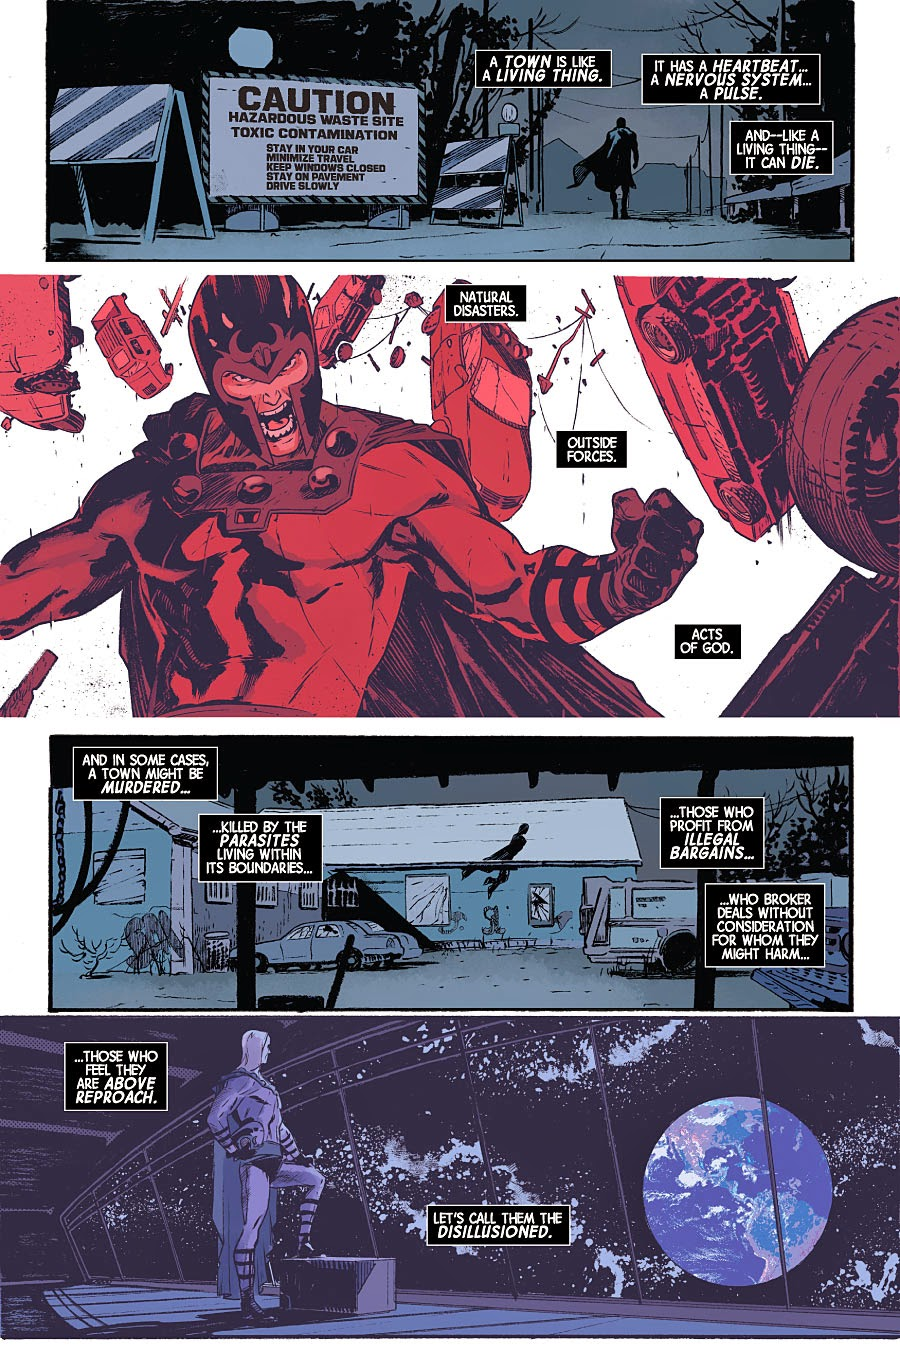 Magneto #8 Interior art by Fernandez